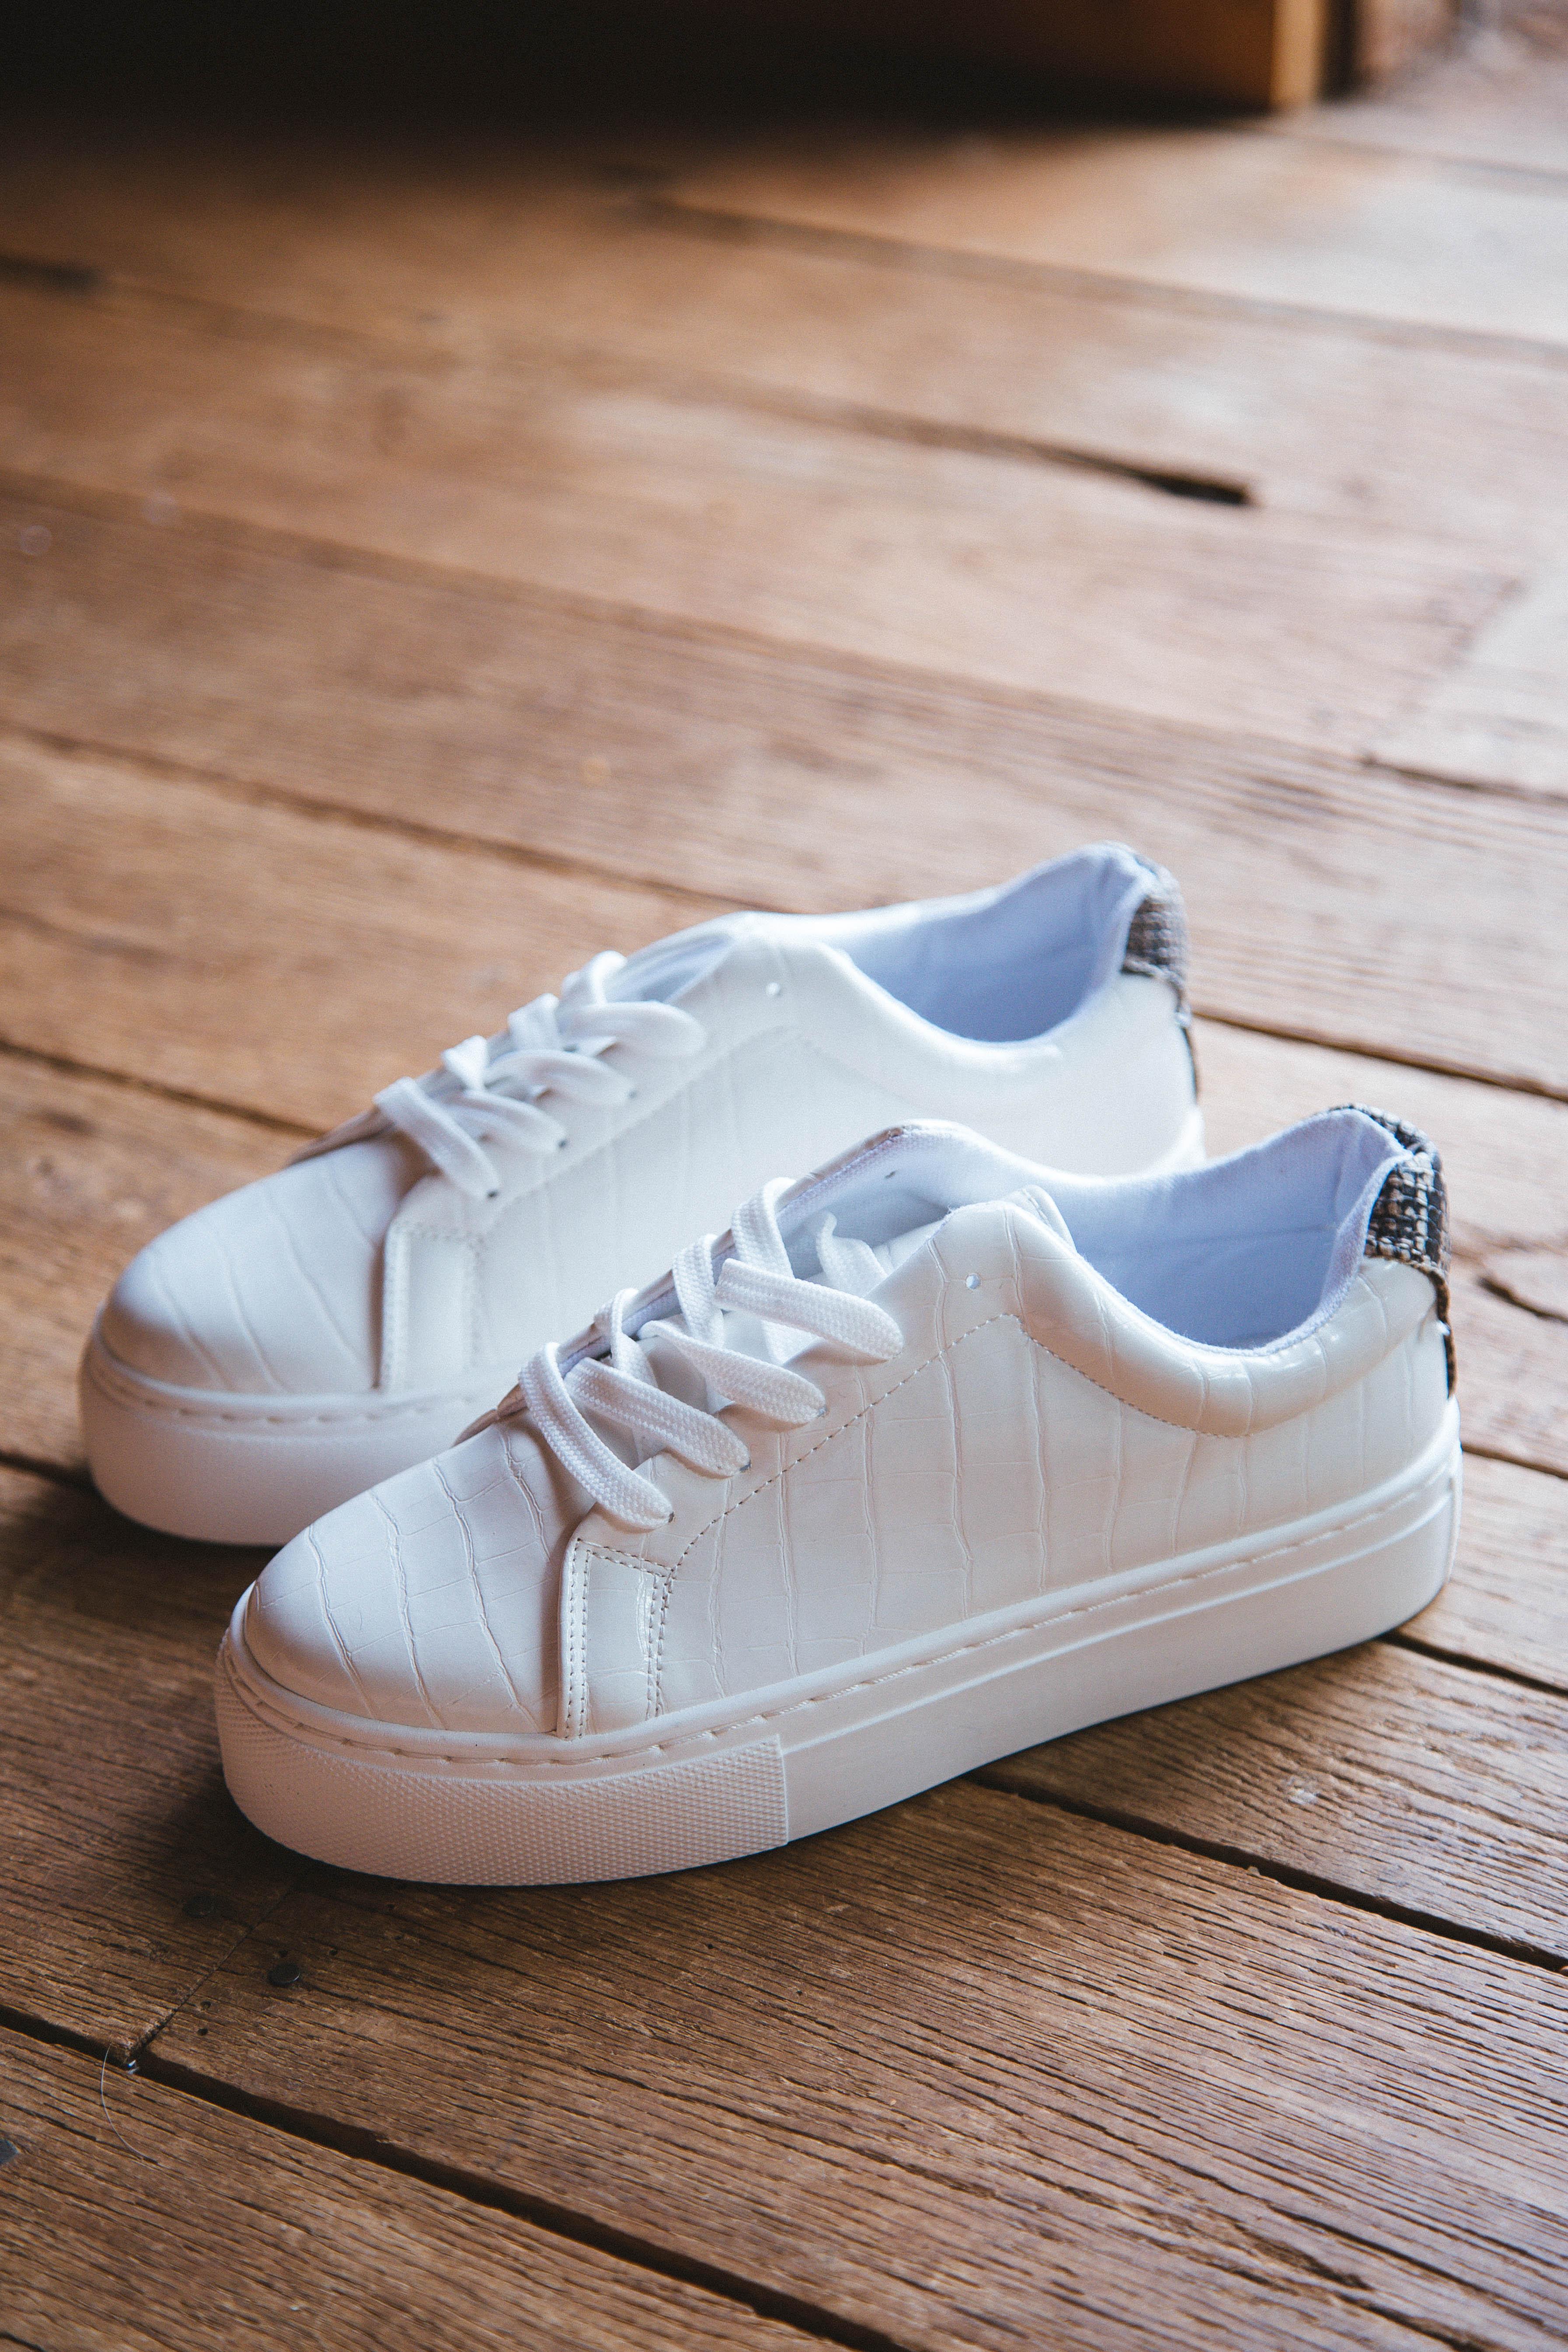 Royal Lace Up Sneaker White Croc